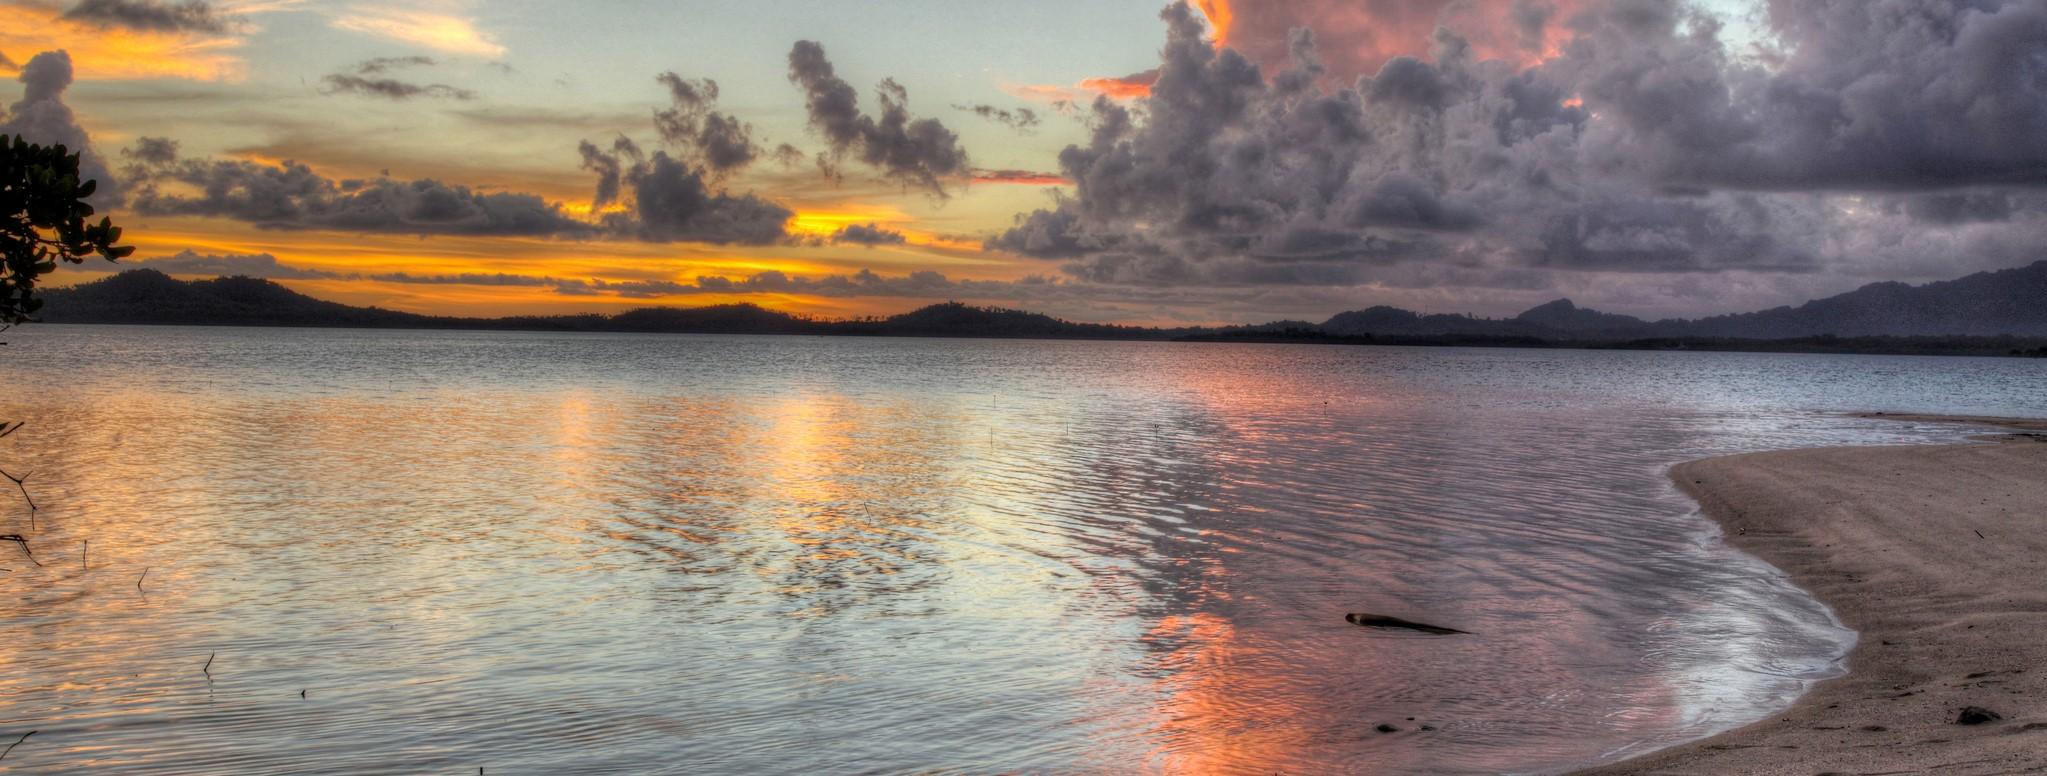 Bougainville (Photo: Jeremy Weate/Flickr)